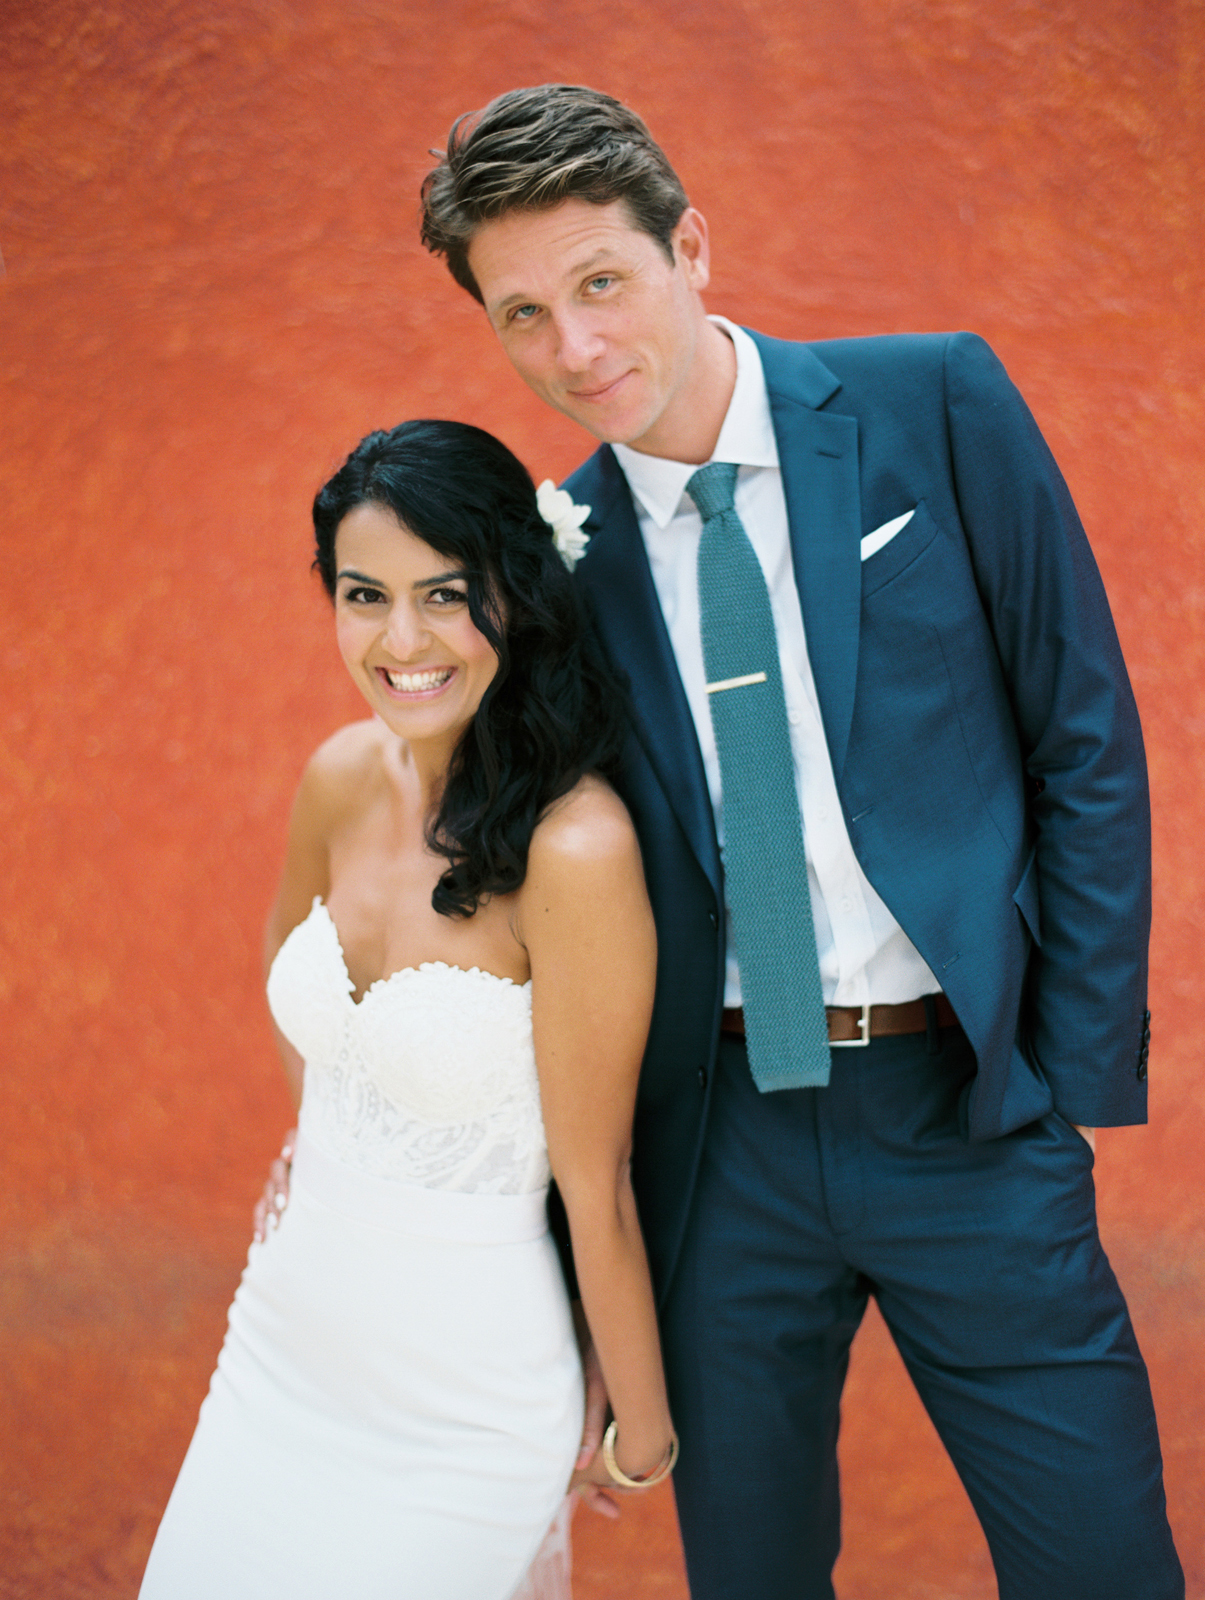 film_wedding_photographer_043.jpg